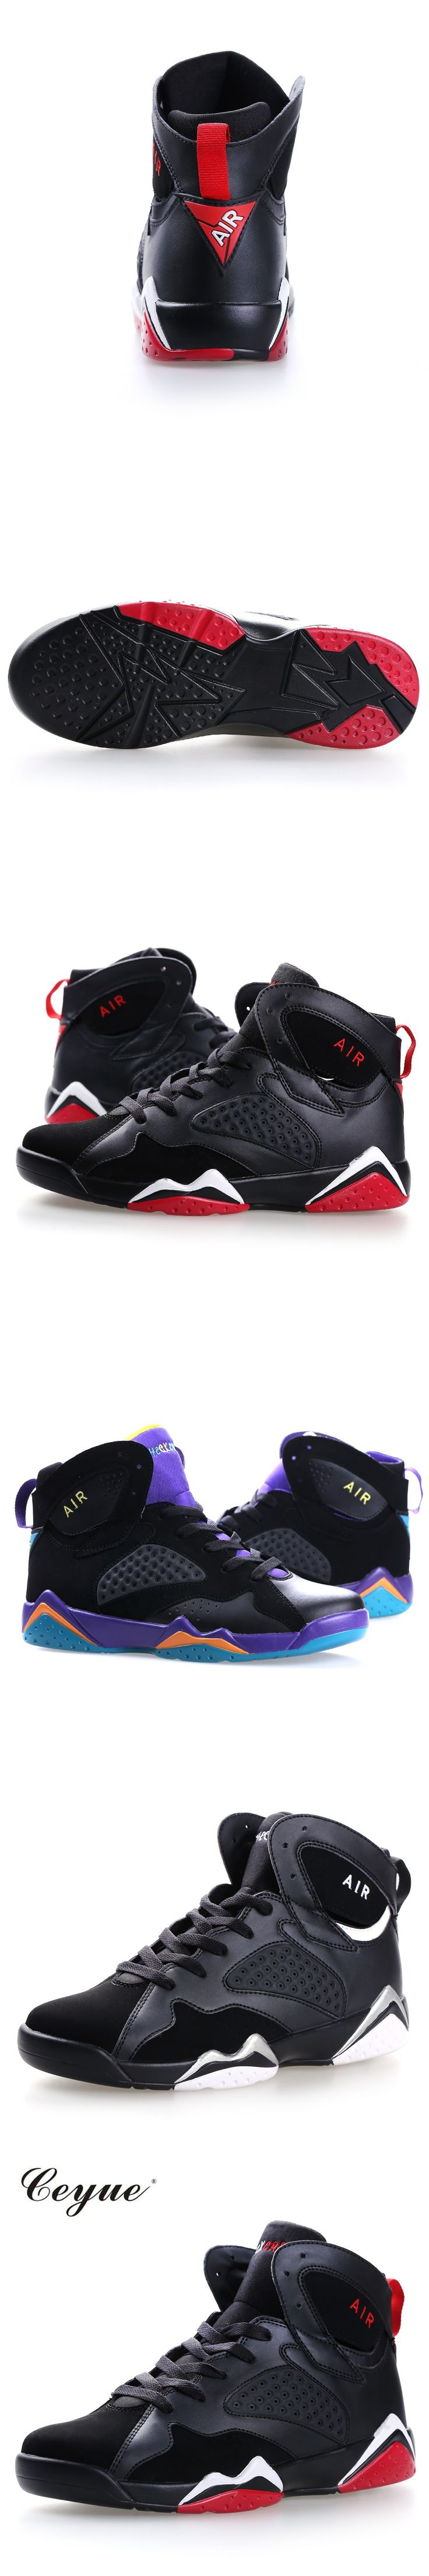 Men Basketball Shoes Air Max Basket Sneakers High Top Sports  Breathable LastestZapatos De Baloncesto Mens Trainers Zapatillas